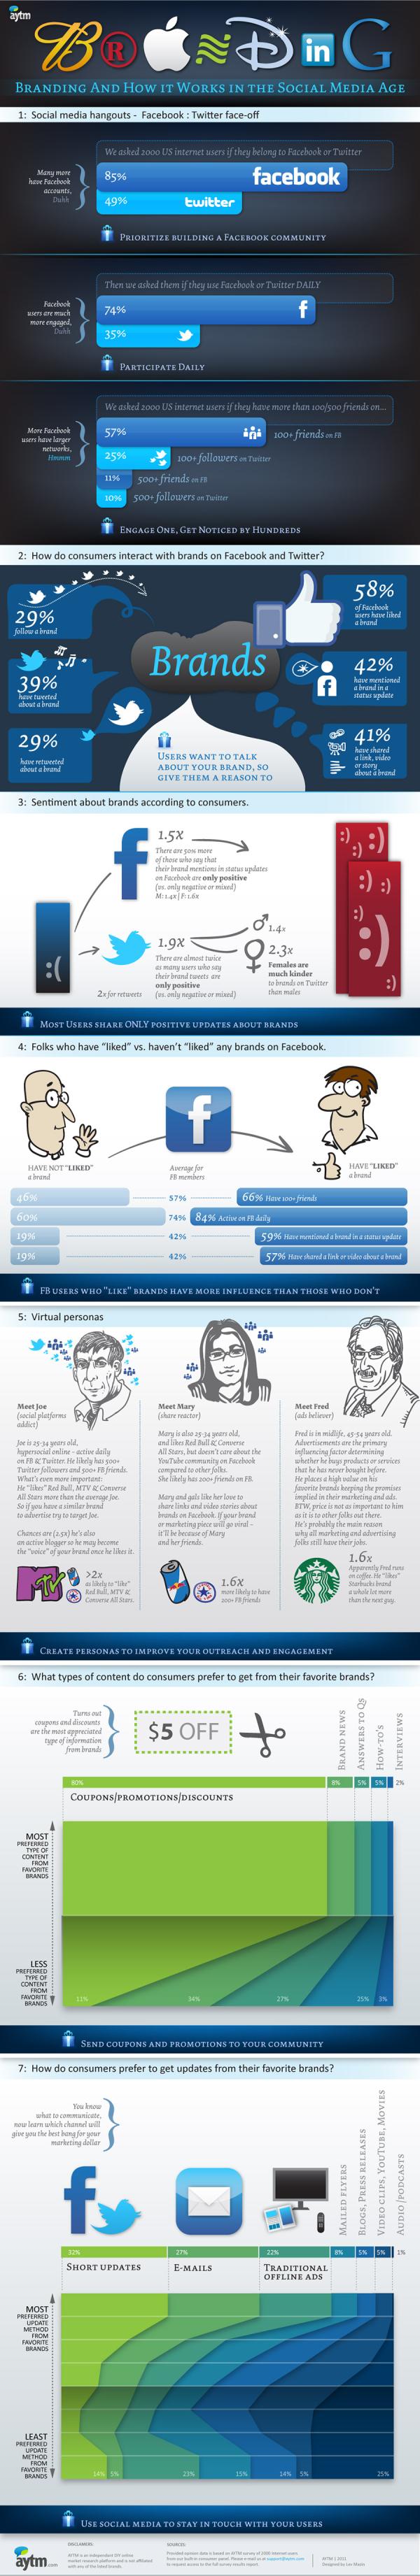 infographic Branding 02 resized 600